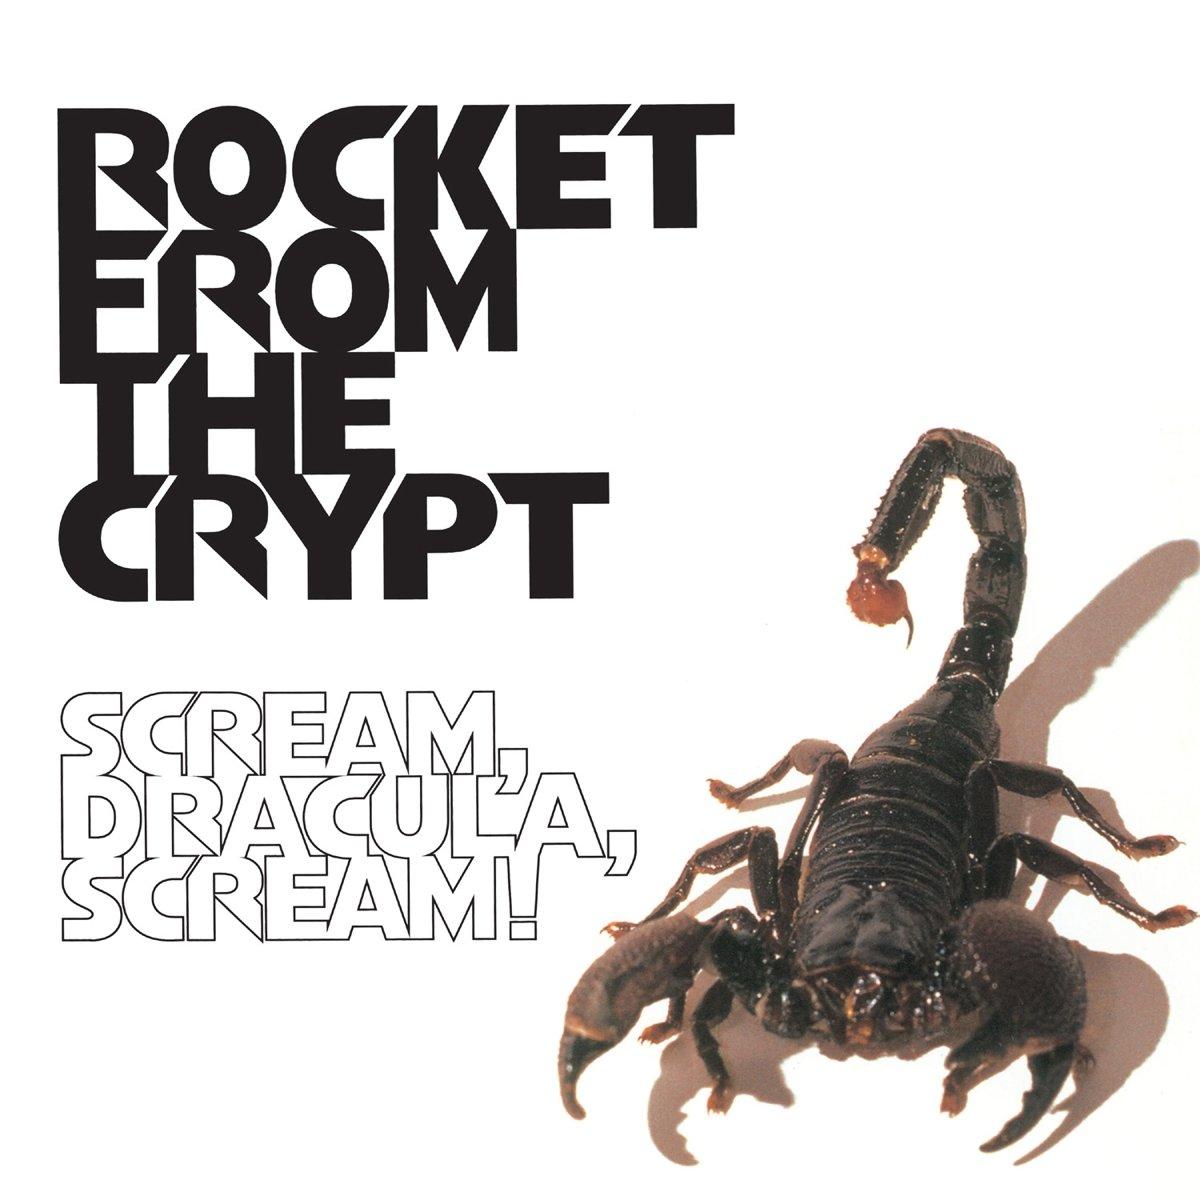 ROCKET FROM THE CRYPT - Scream Dracula Screa - Amazon.com Music